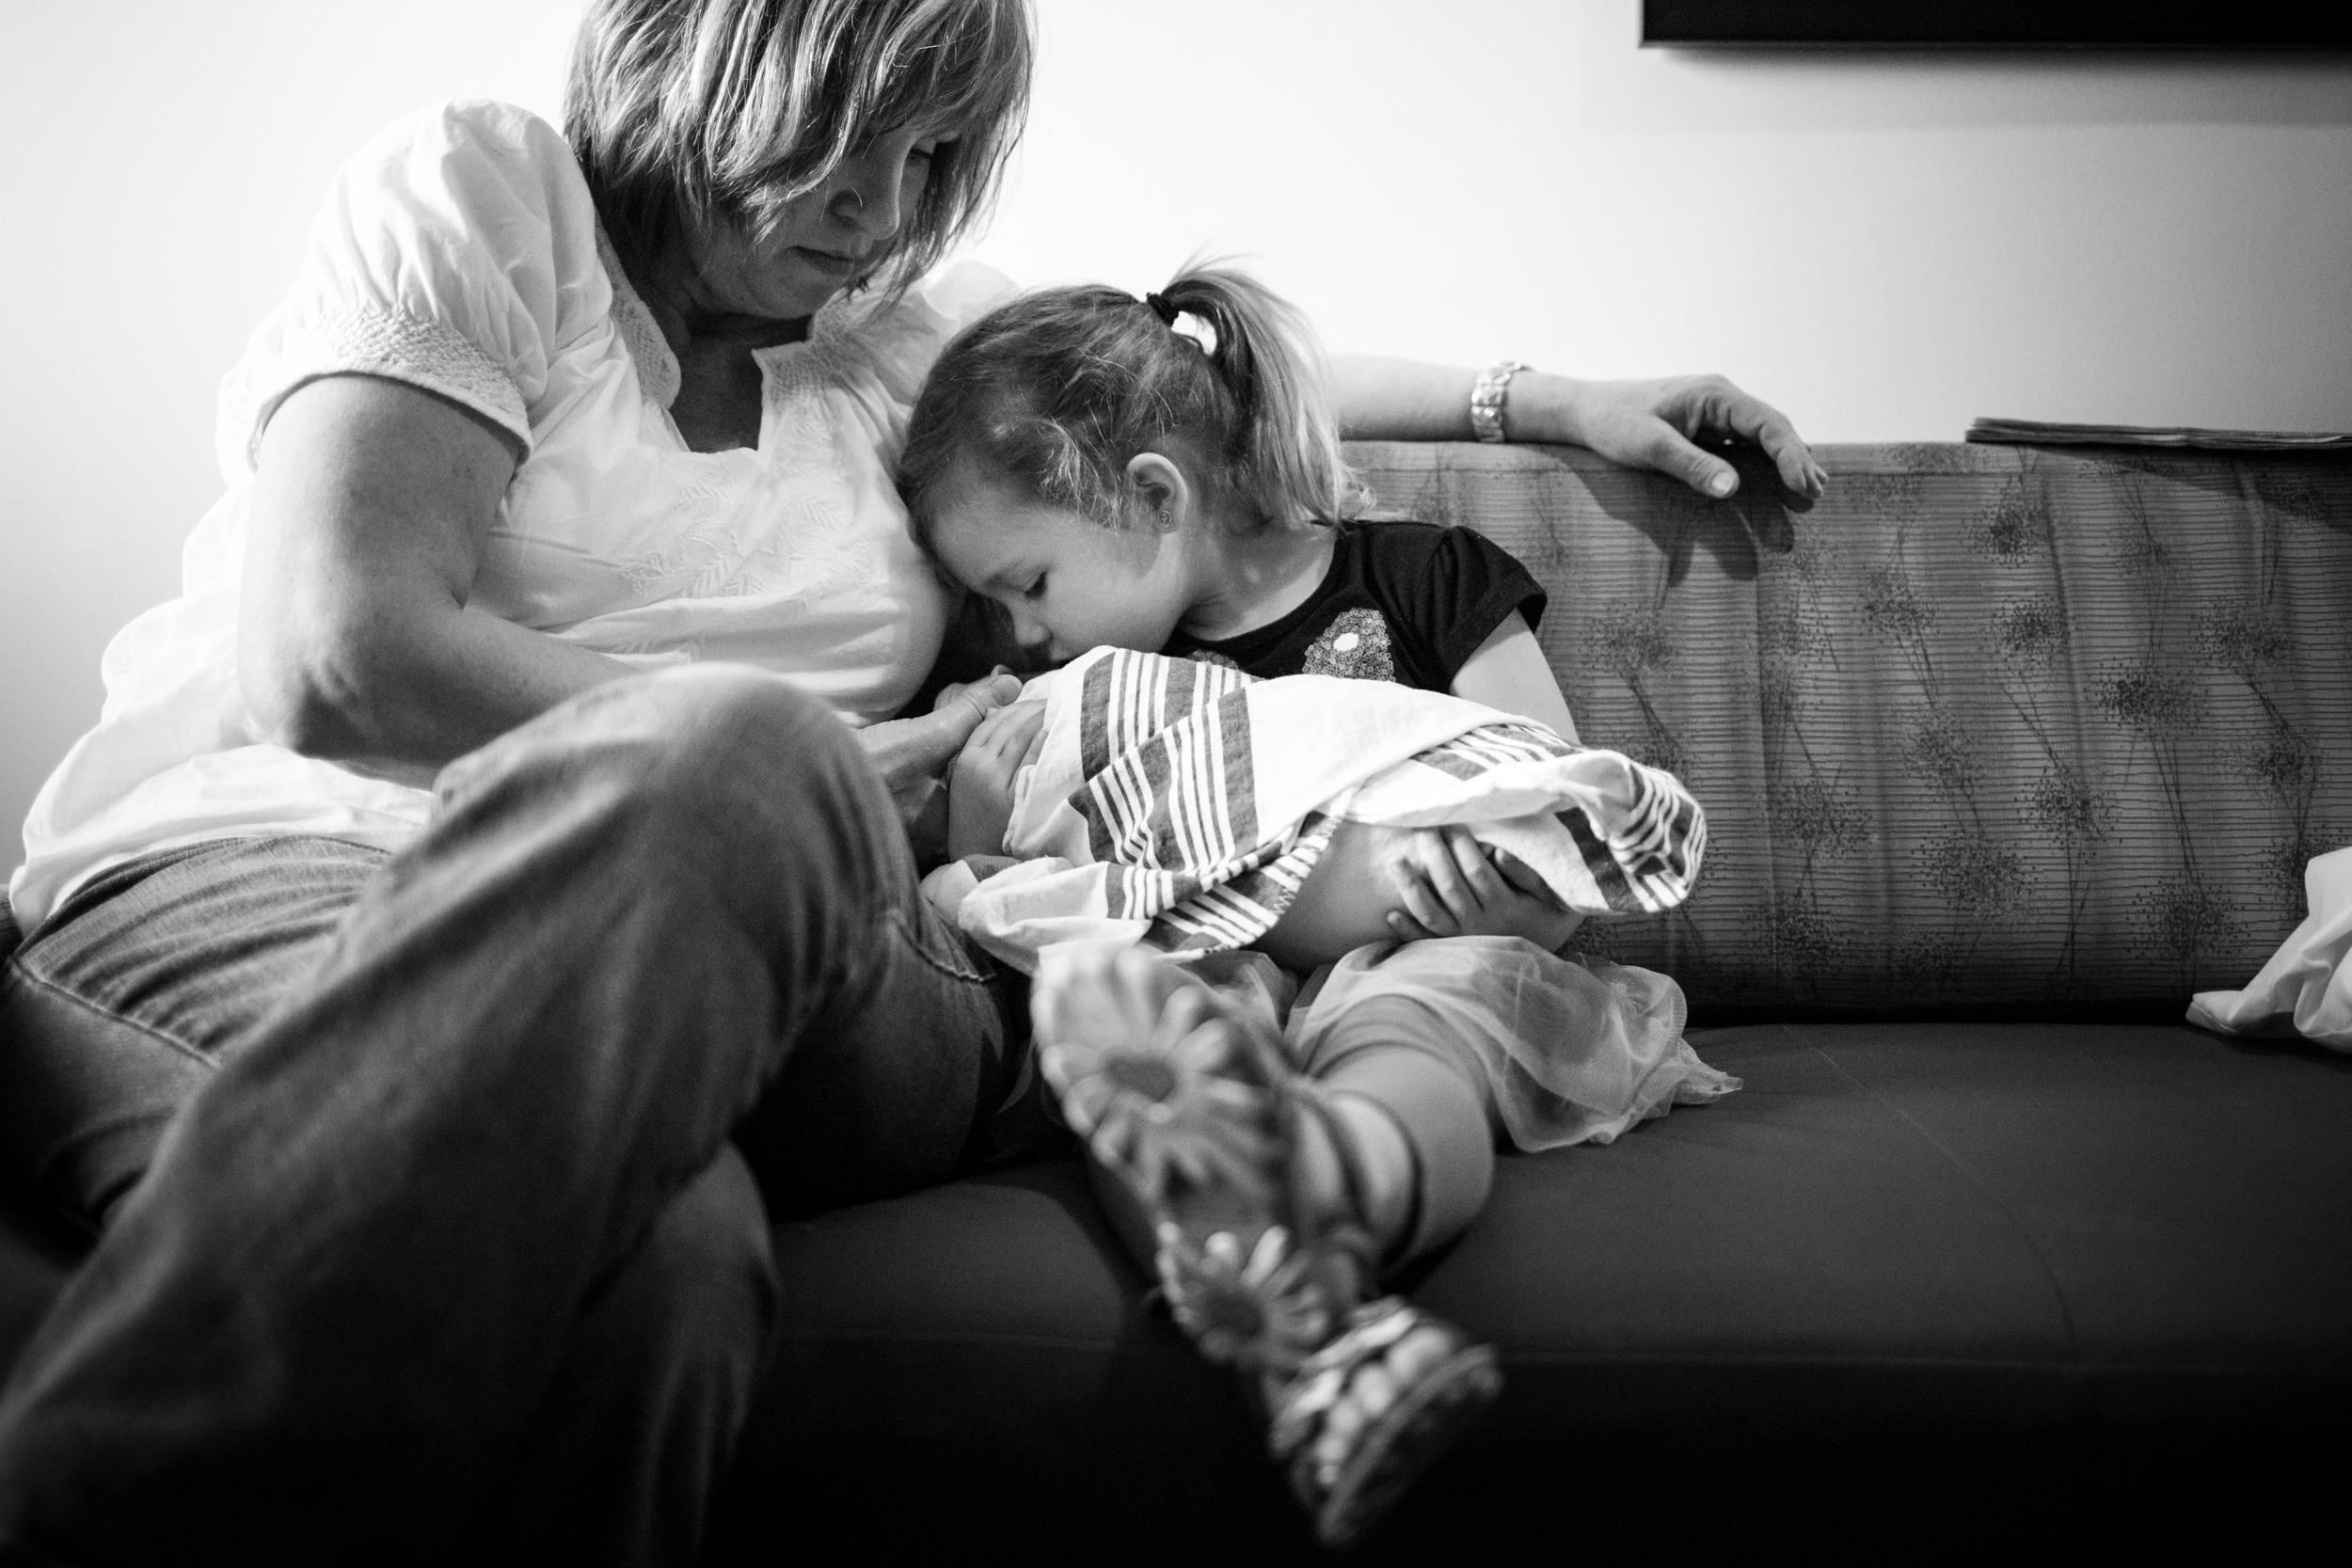 jacksonville birth photographer_duckwilertwins-28.jpg